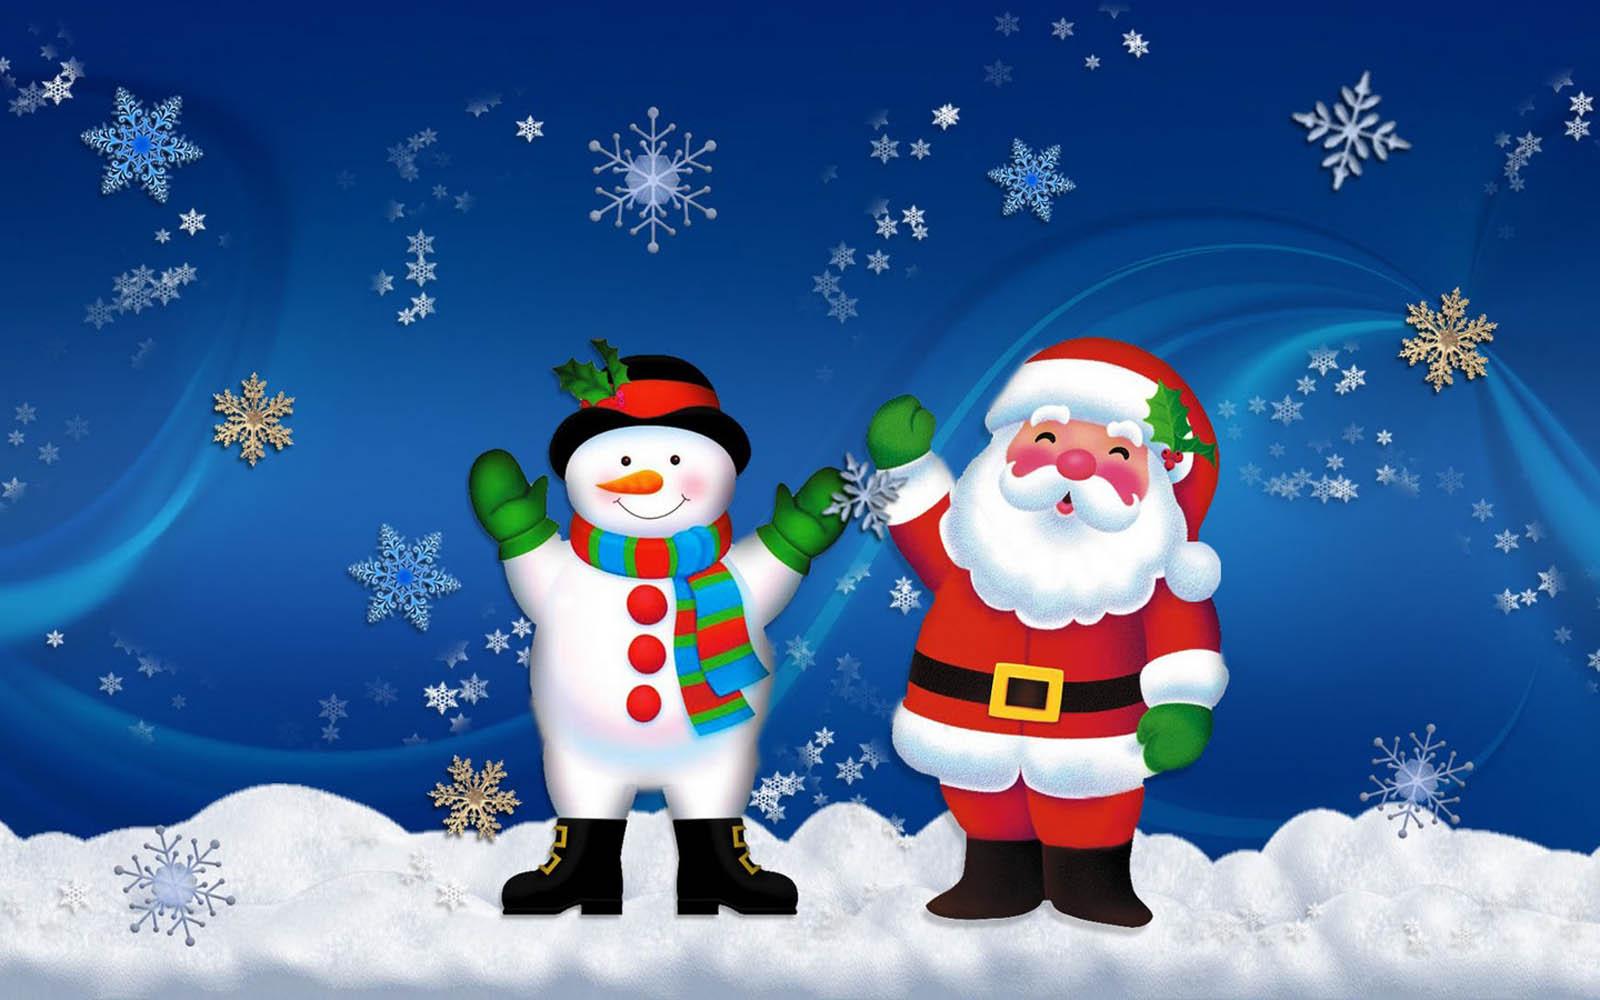 snowman desktop background - photo #5